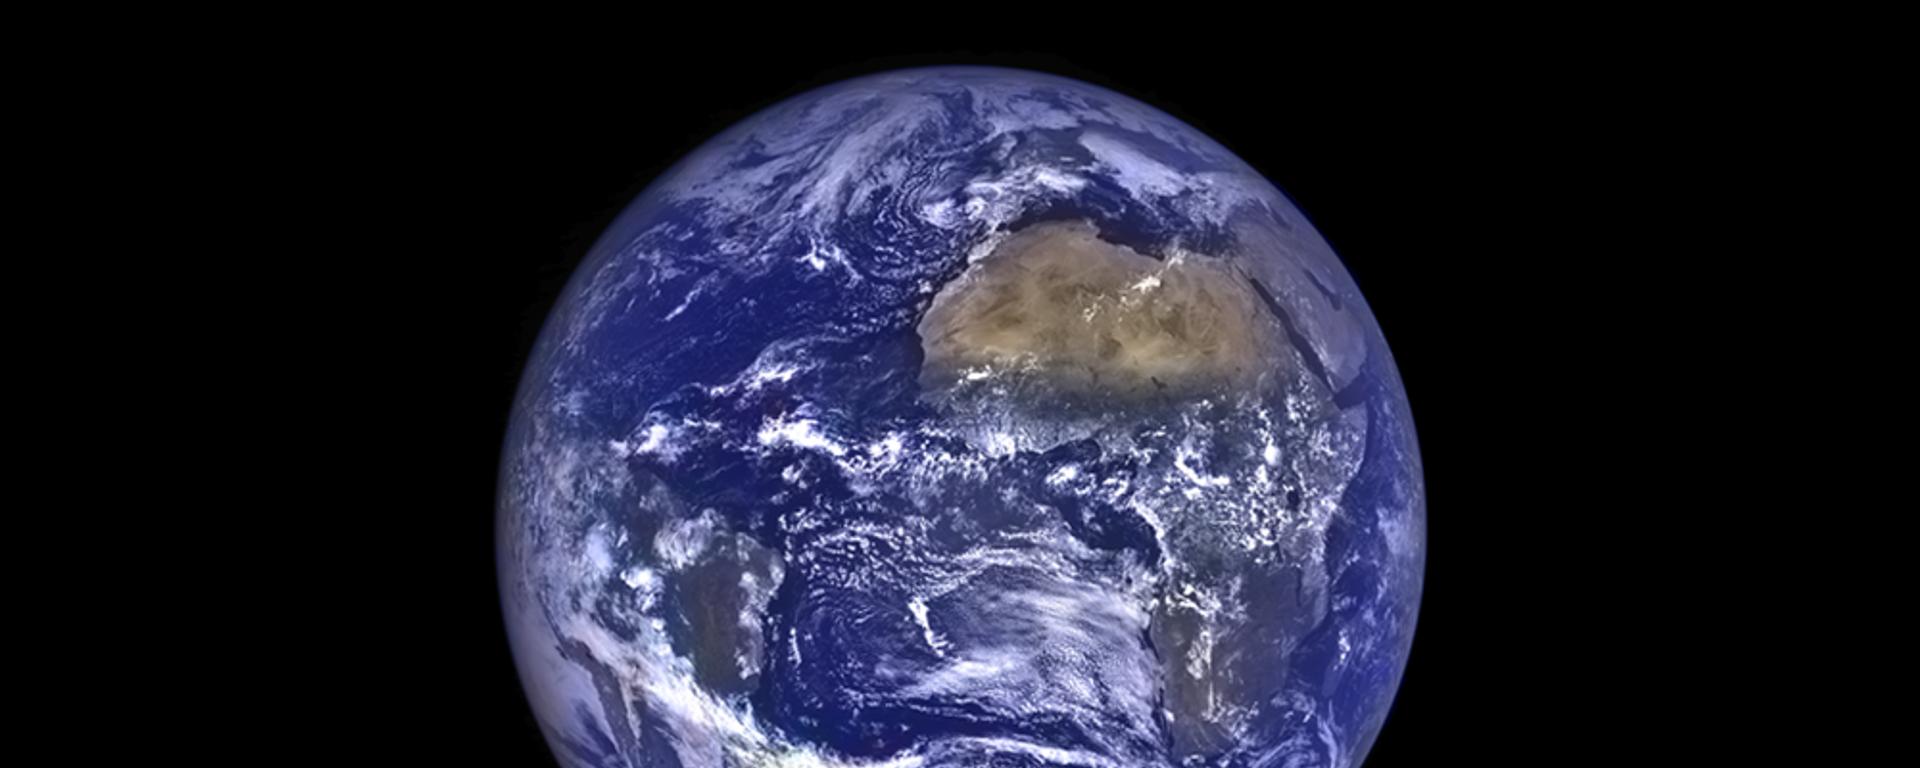 Вид Земли с орбиты Луны - Sputnik Узбекистан, 1920, 19.02.2021